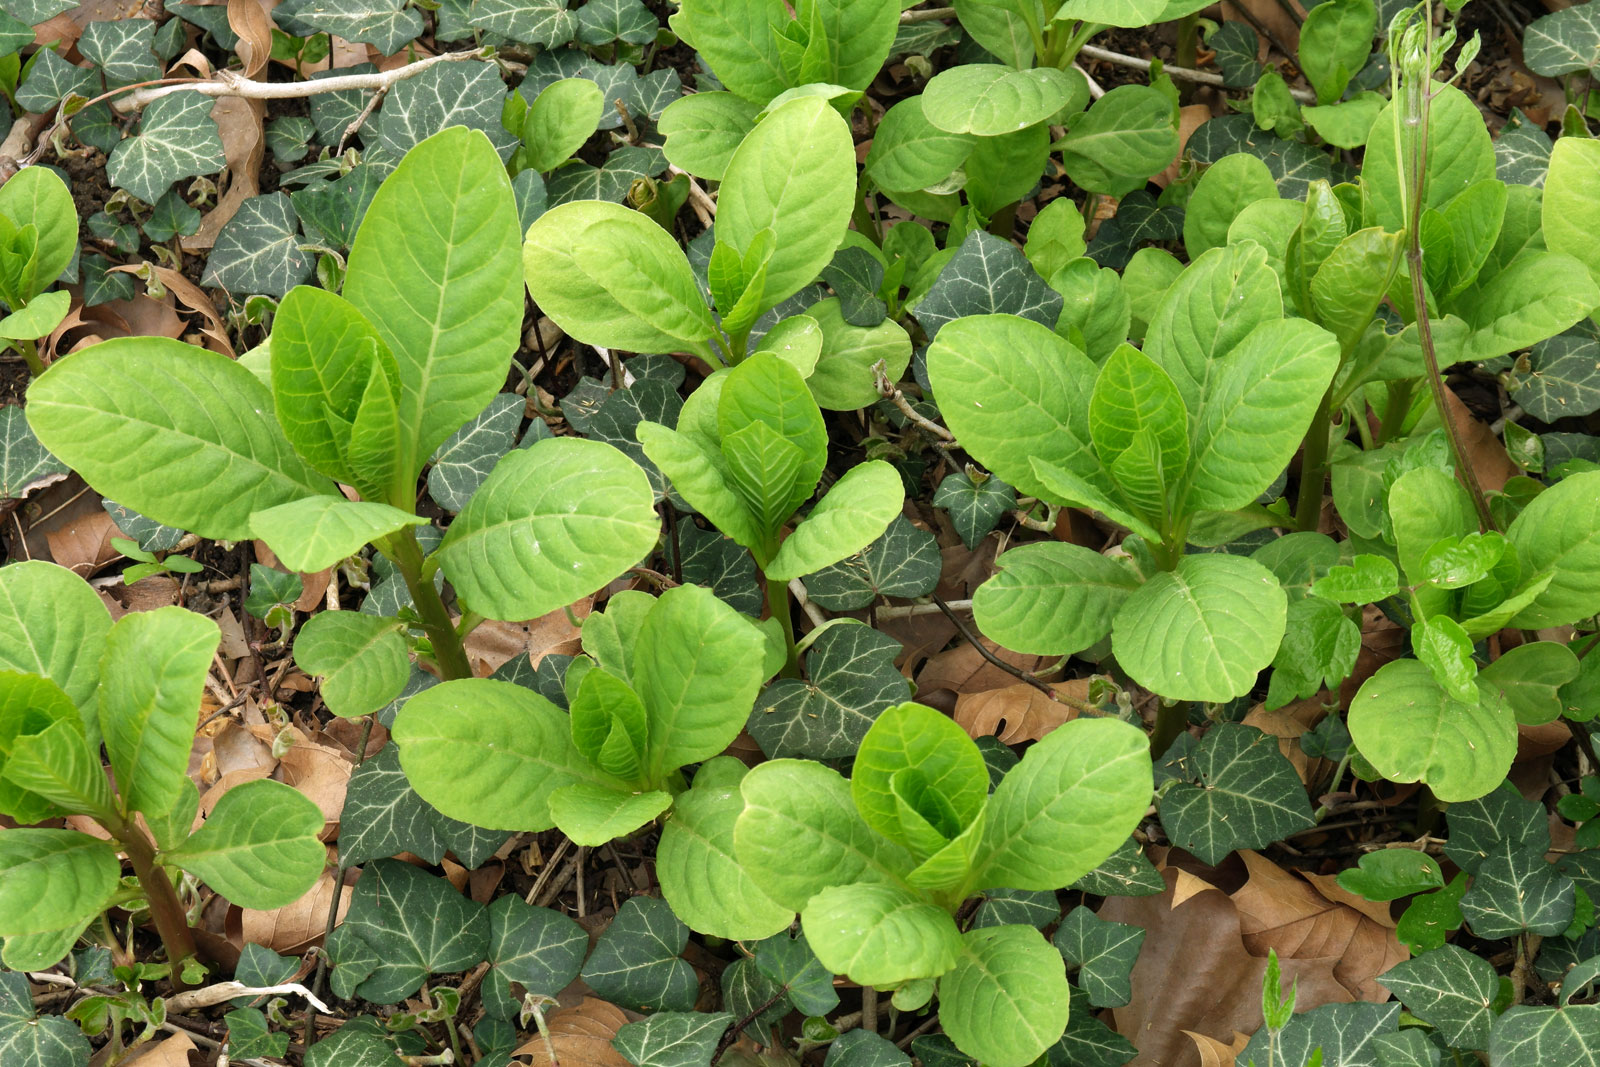 Phytolacca acinosa